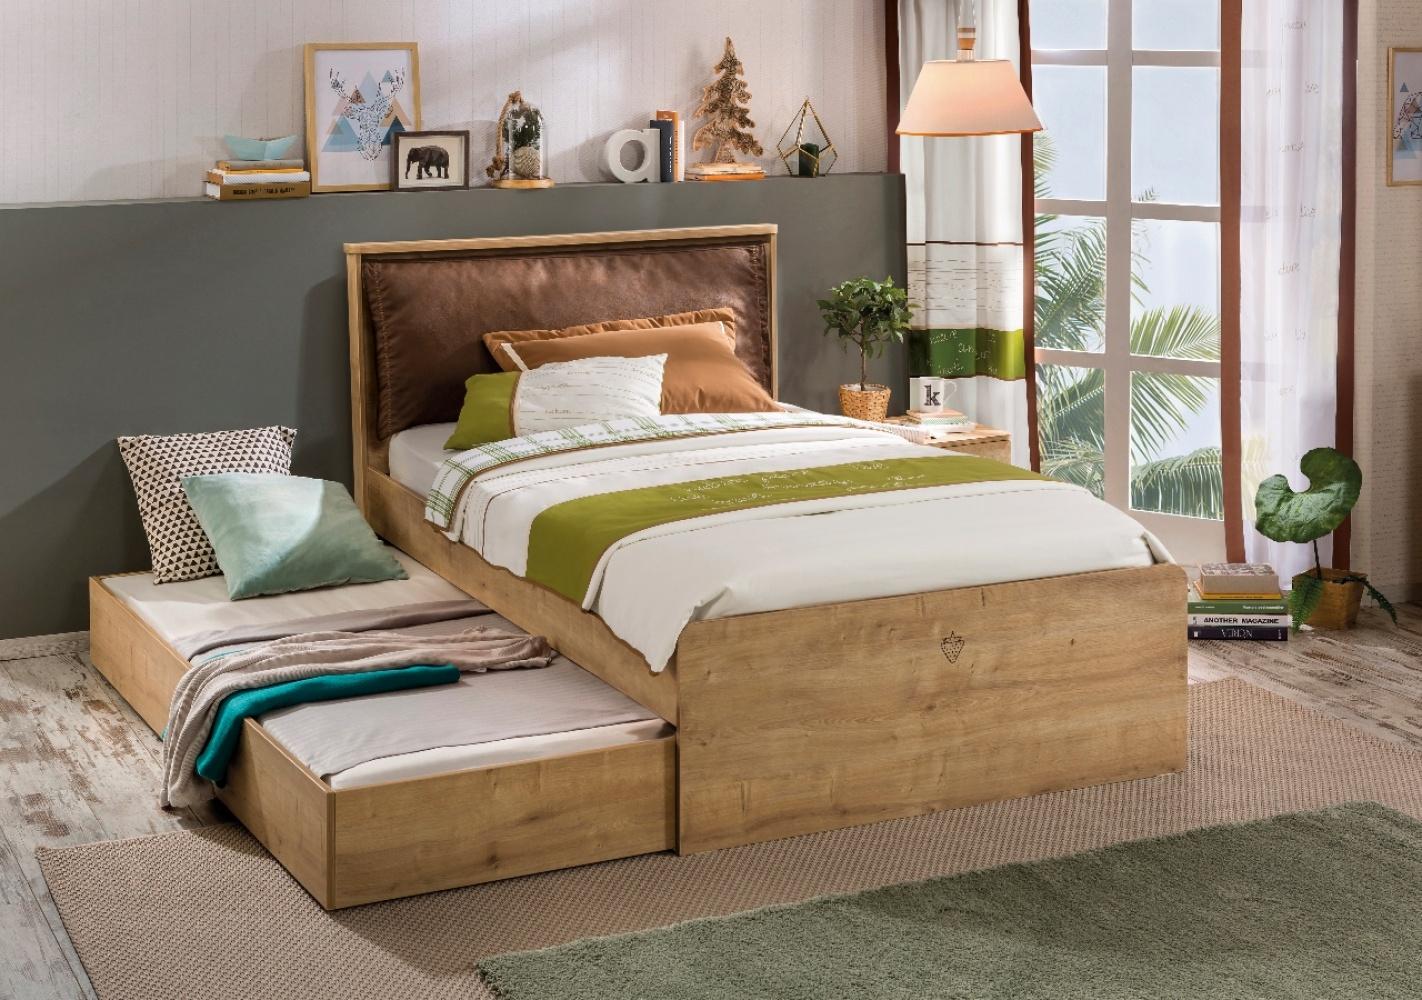 mocha jugend bett 120x200cm natur kopfteil gepolstert traum m. Black Bedroom Furniture Sets. Home Design Ideas